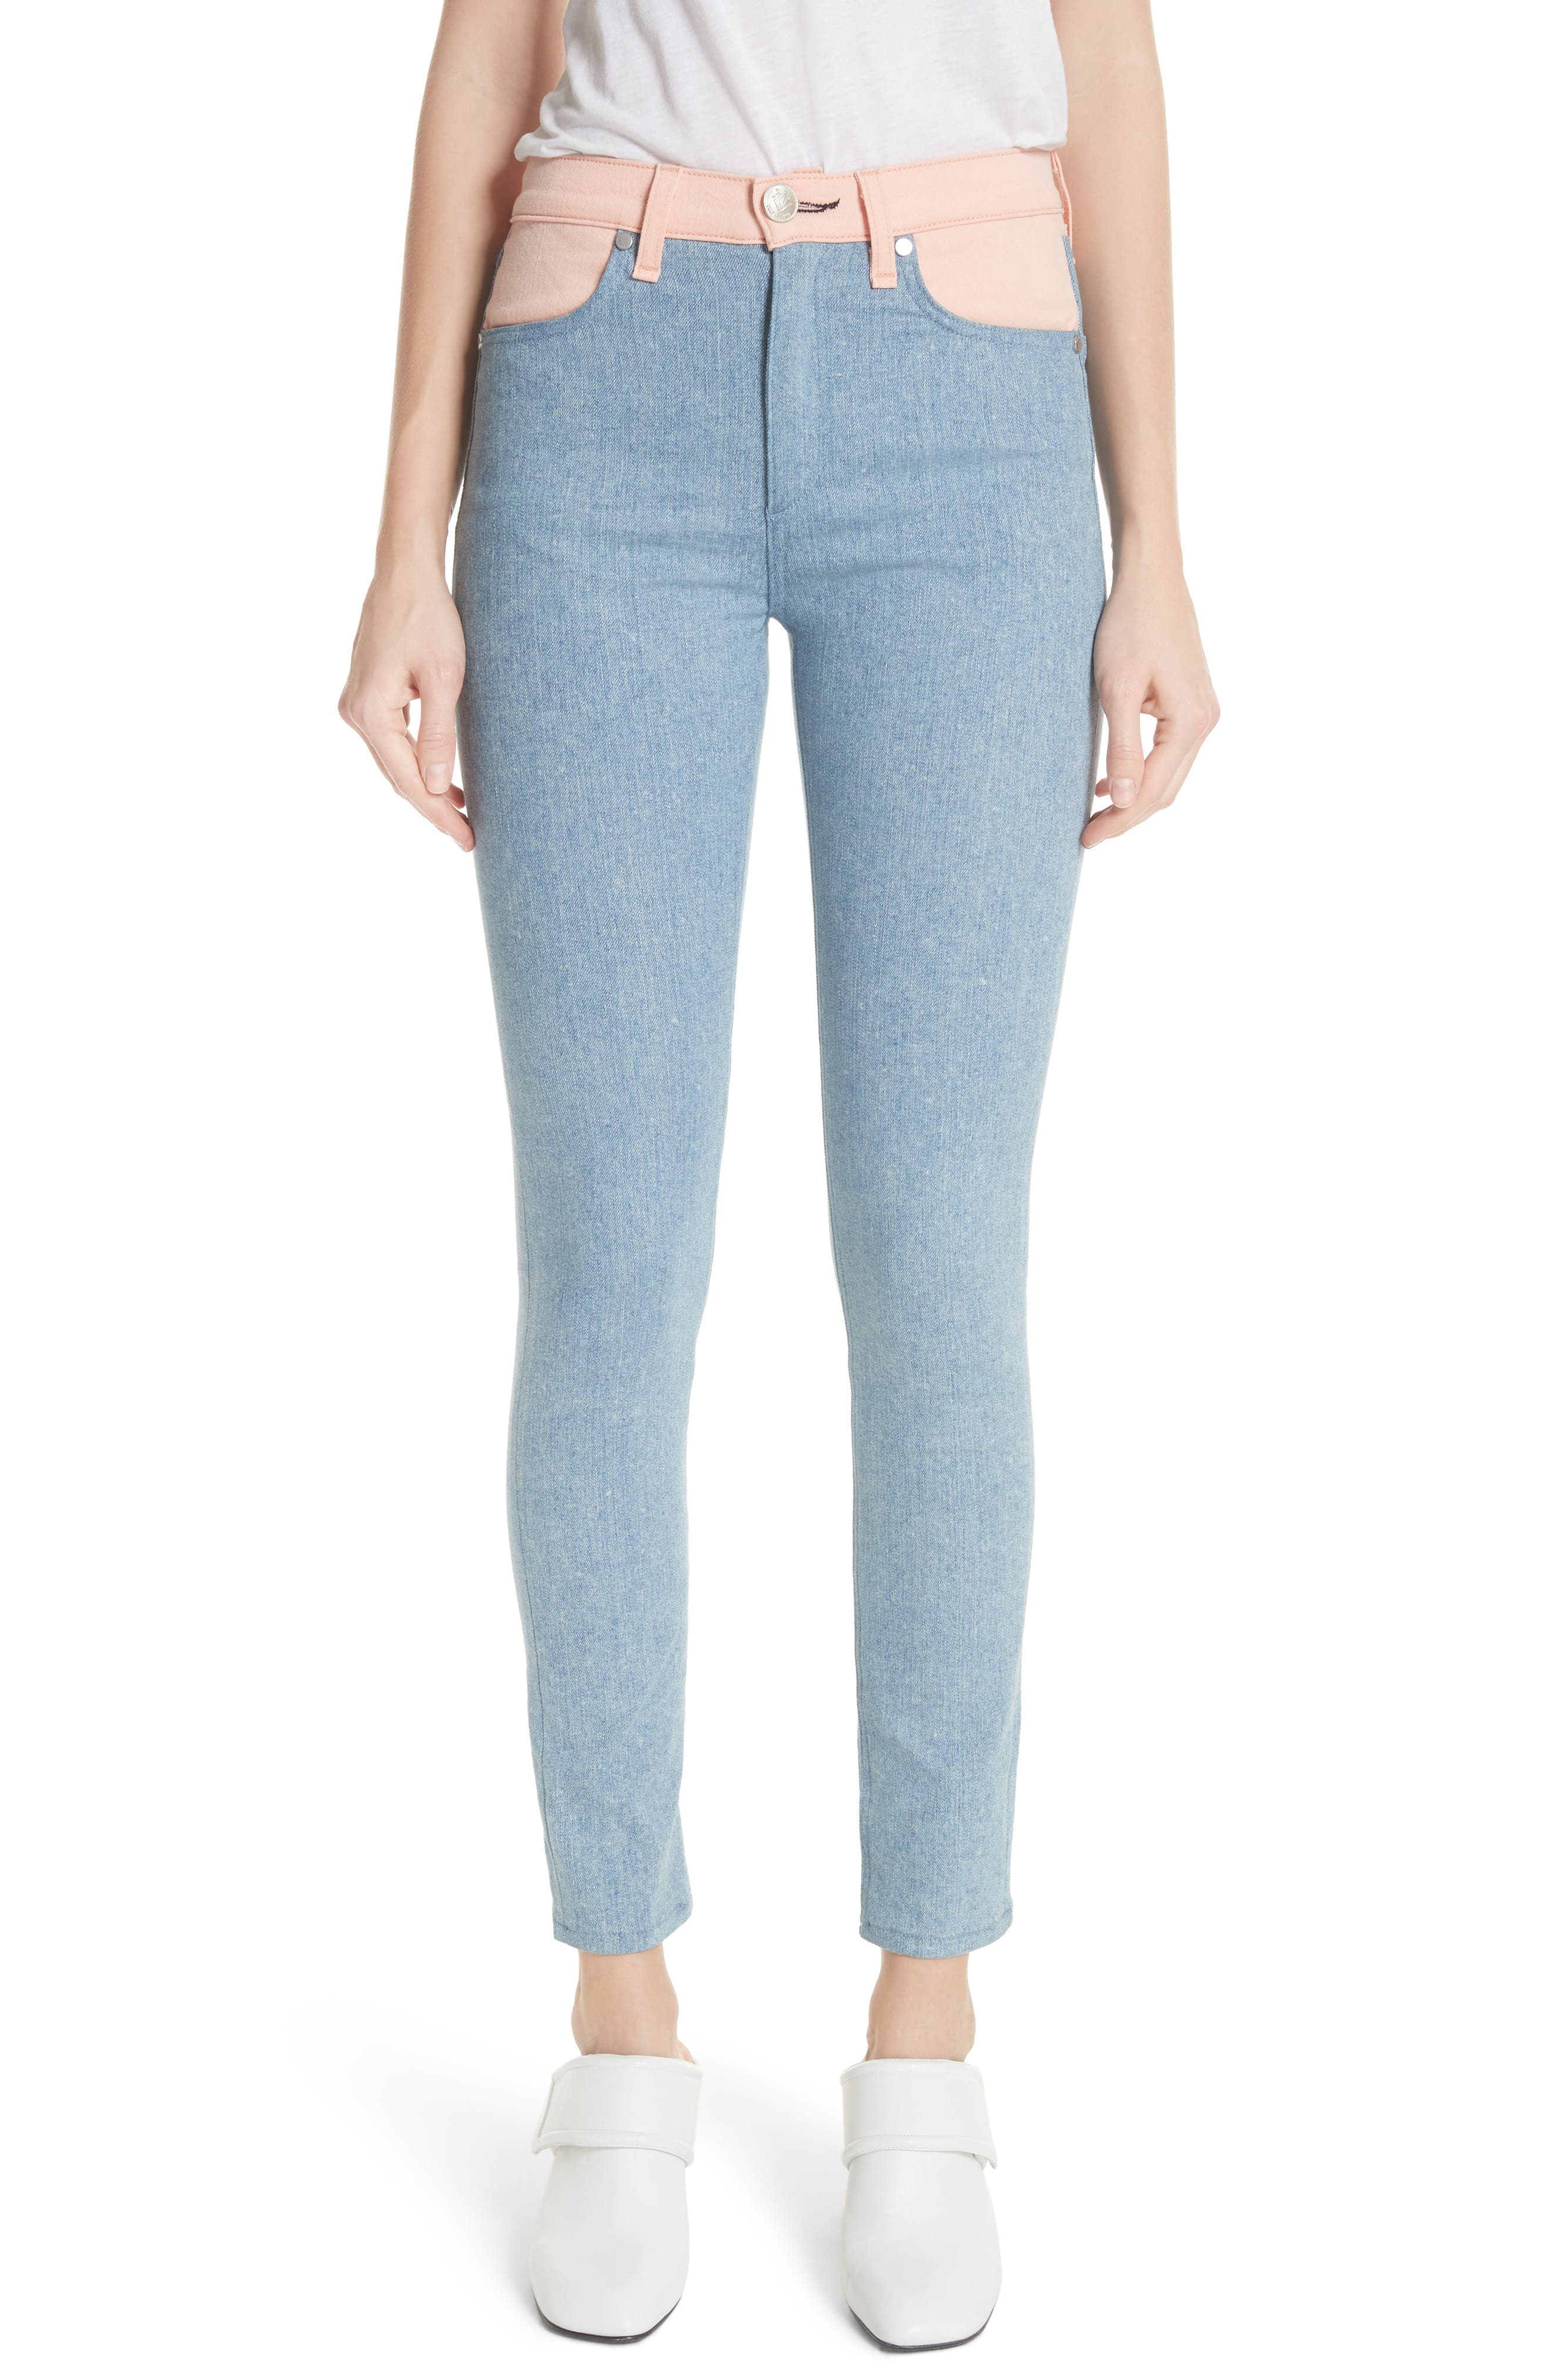 Phila Skinny Jeans,                             Main thumbnail 1, color,                             Nelly/ Prairie